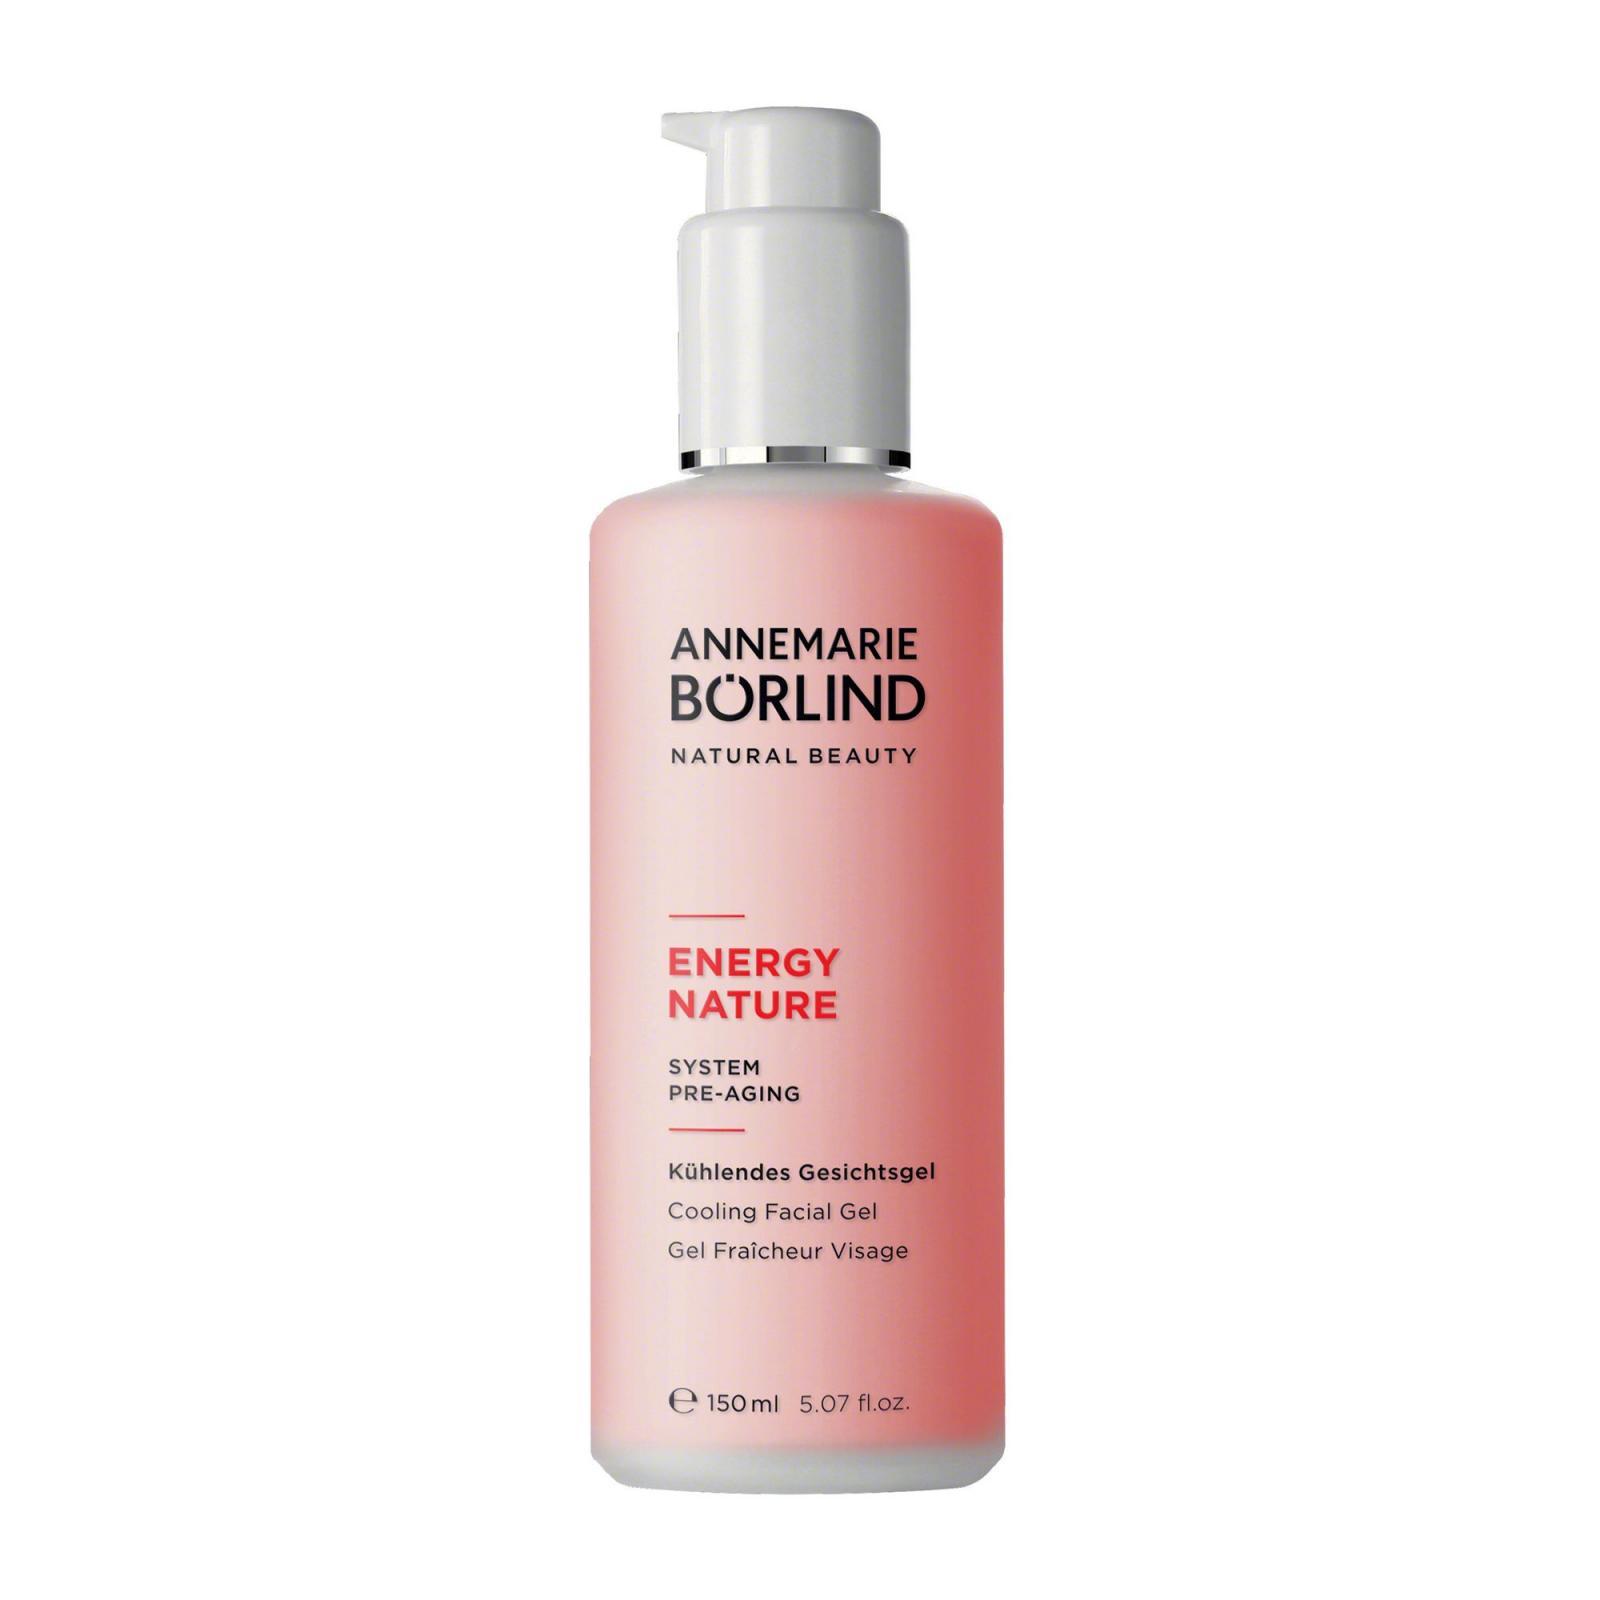 Annemarie Borlind Chladivý pleťový gel, Energynature 150 ml